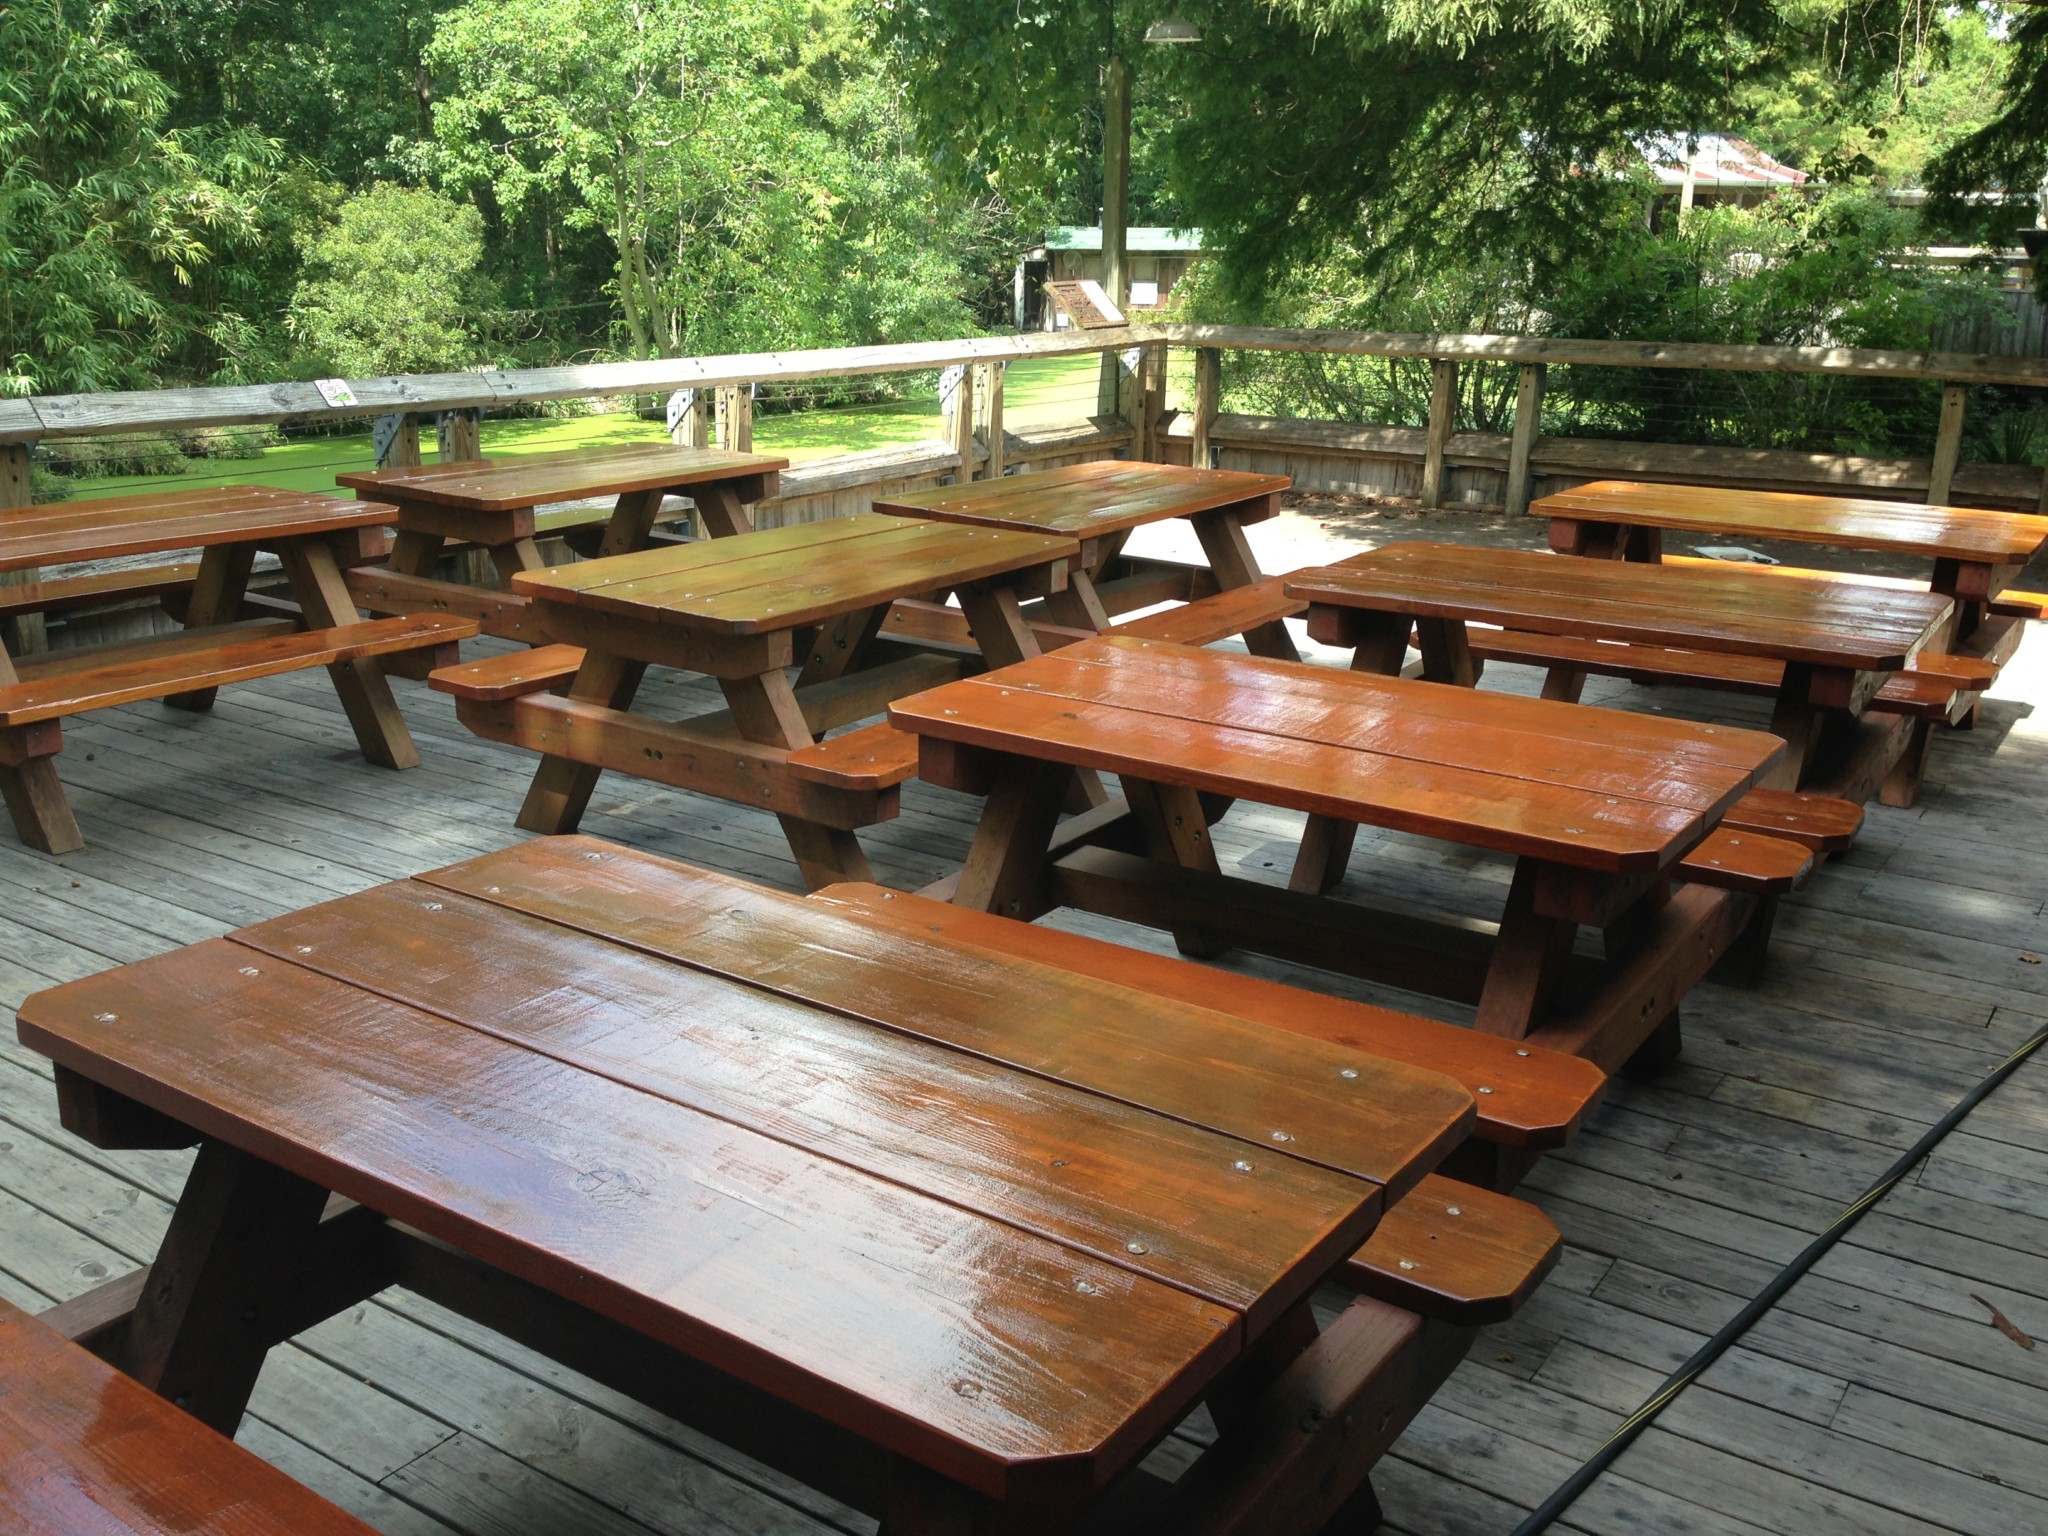 garden vifah com wood dp amazon feet outdoor bench furniture